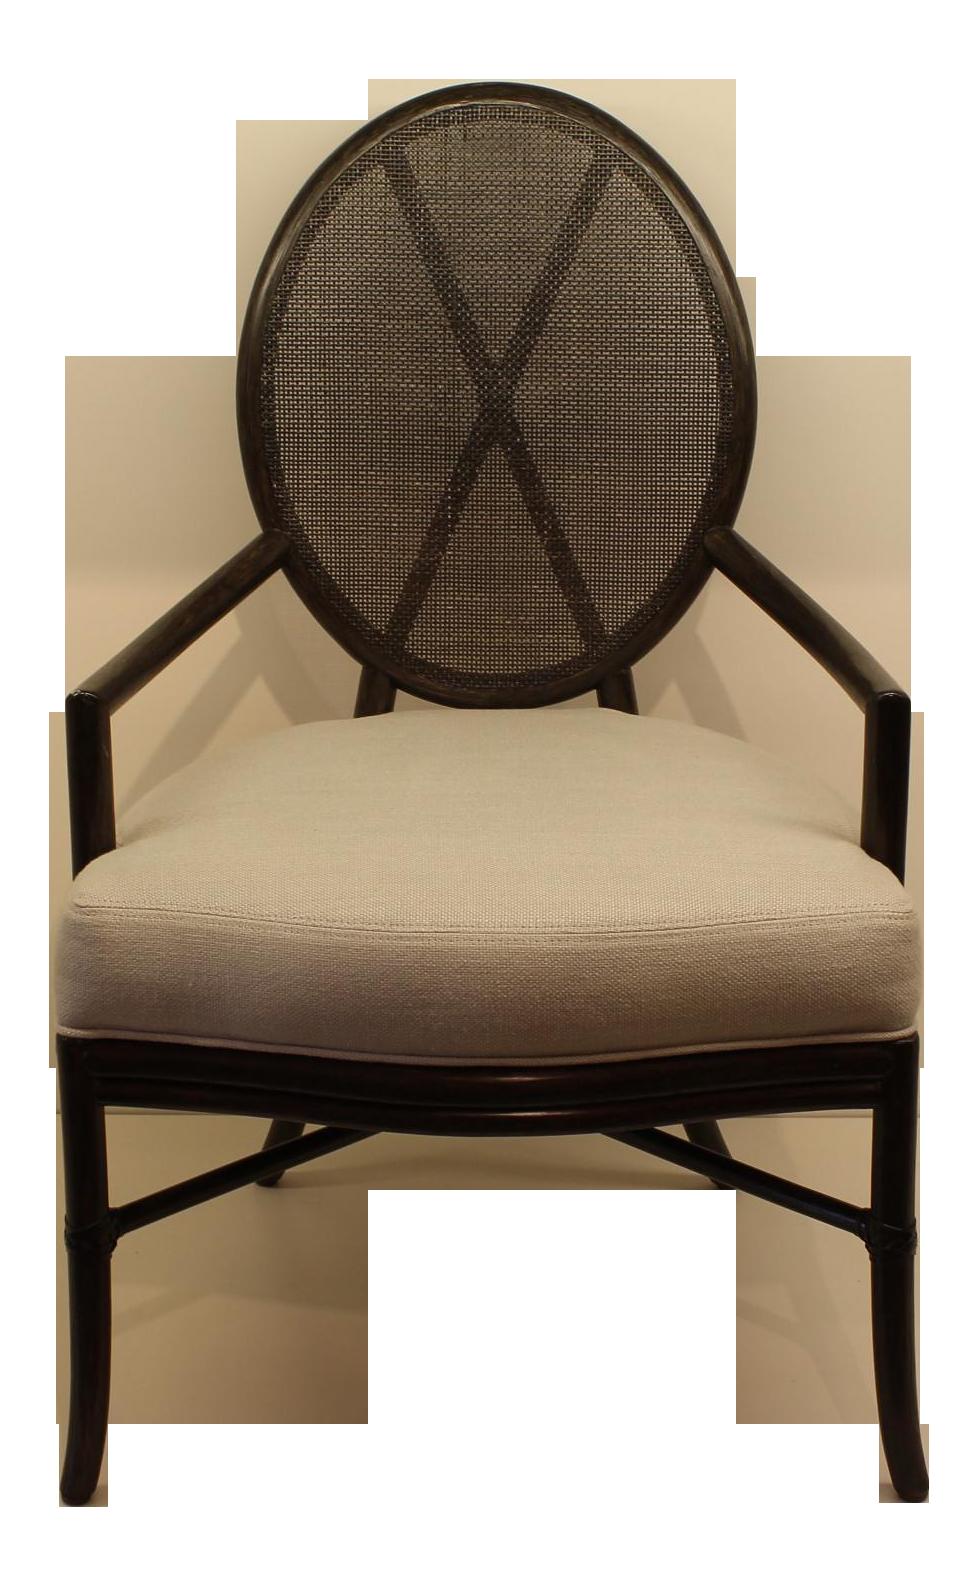 Mcguire Barbara Barry Oval X Back Chair Chairish